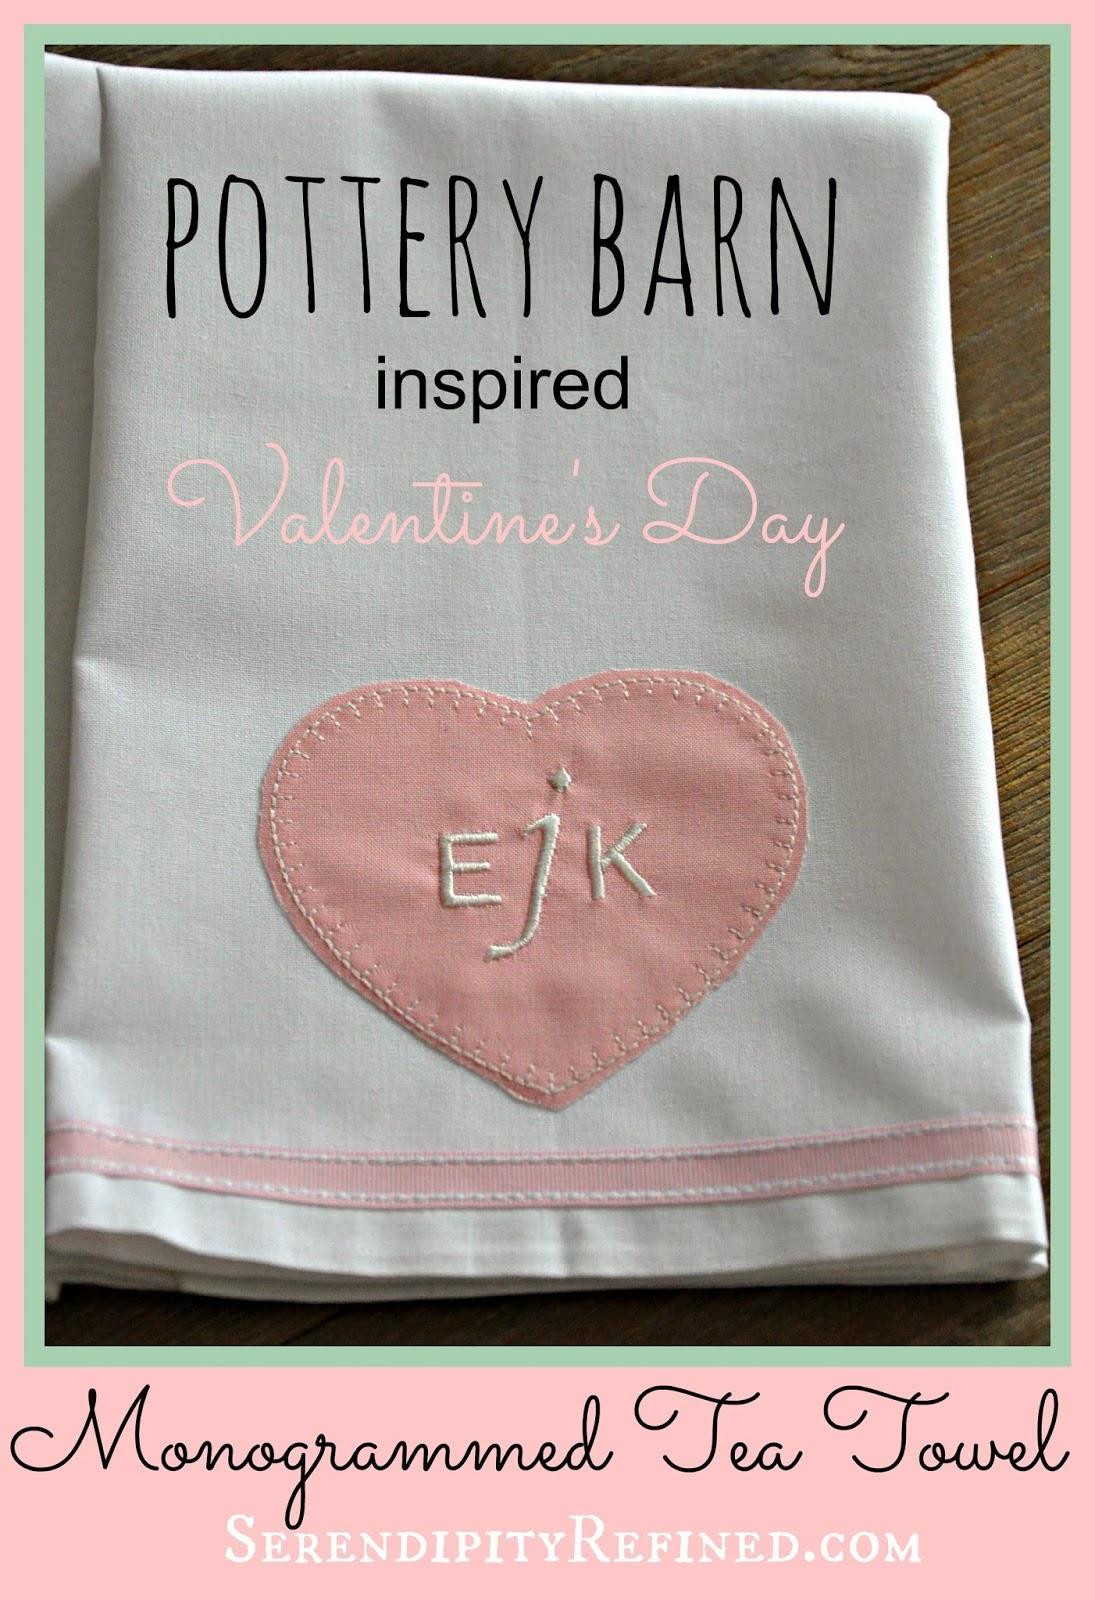 Merveilleux Pottery Barn Inspired Valentineu0027s Day Monogrammed Towel